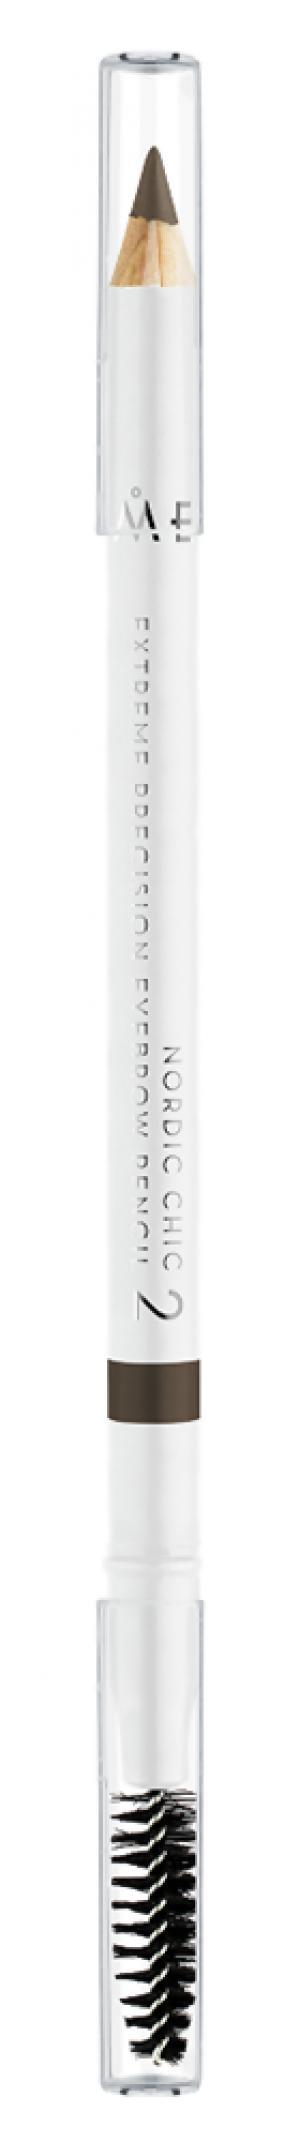 Карандаш для бровей Lumene 2 Серый. Цвет: 2 серый